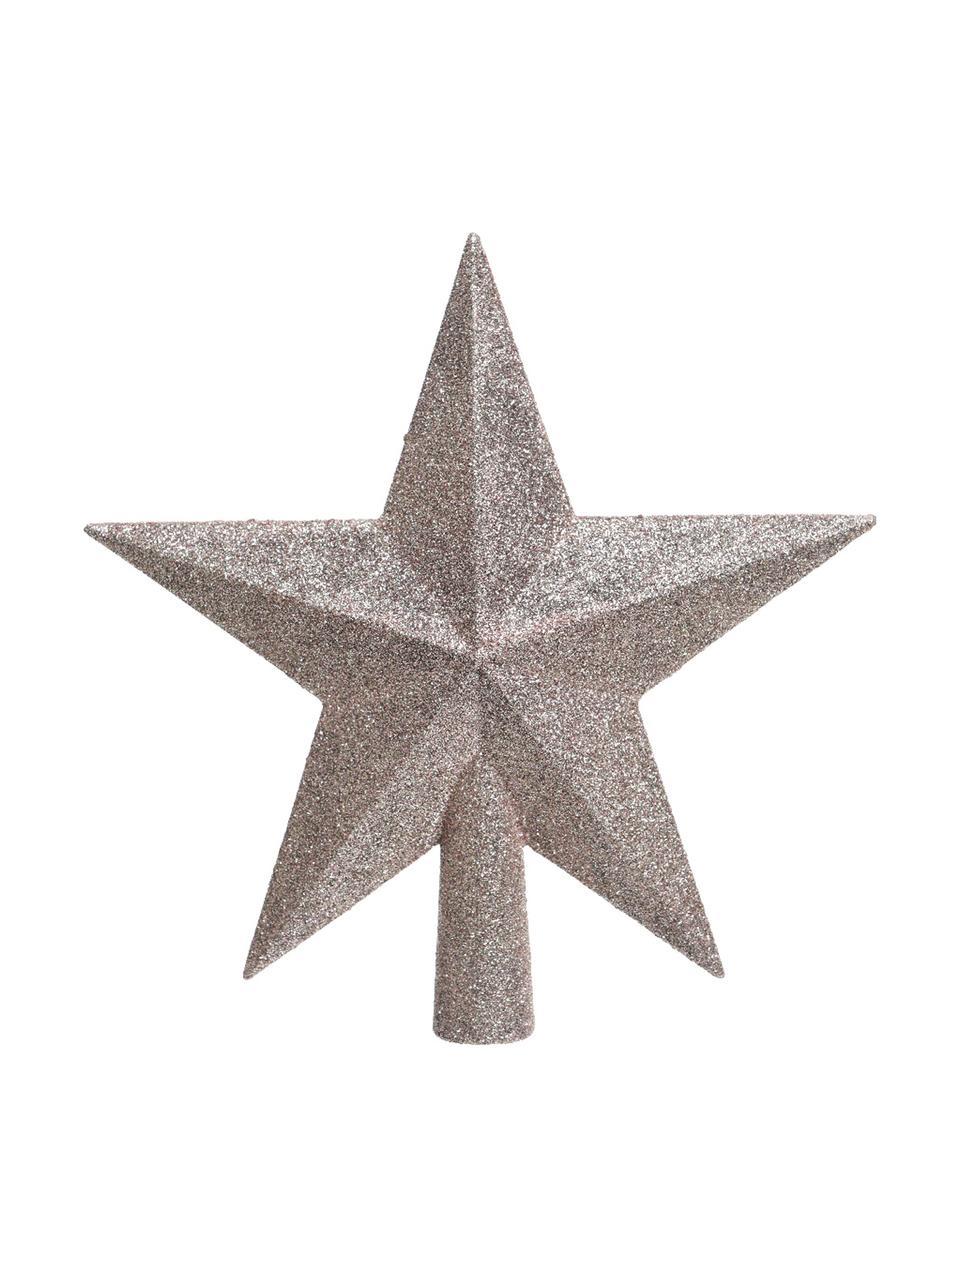 Puntale per albero Stern, Materiale sintetico, glitter, Rosa, Larg. 19 x Alt. 19 cm